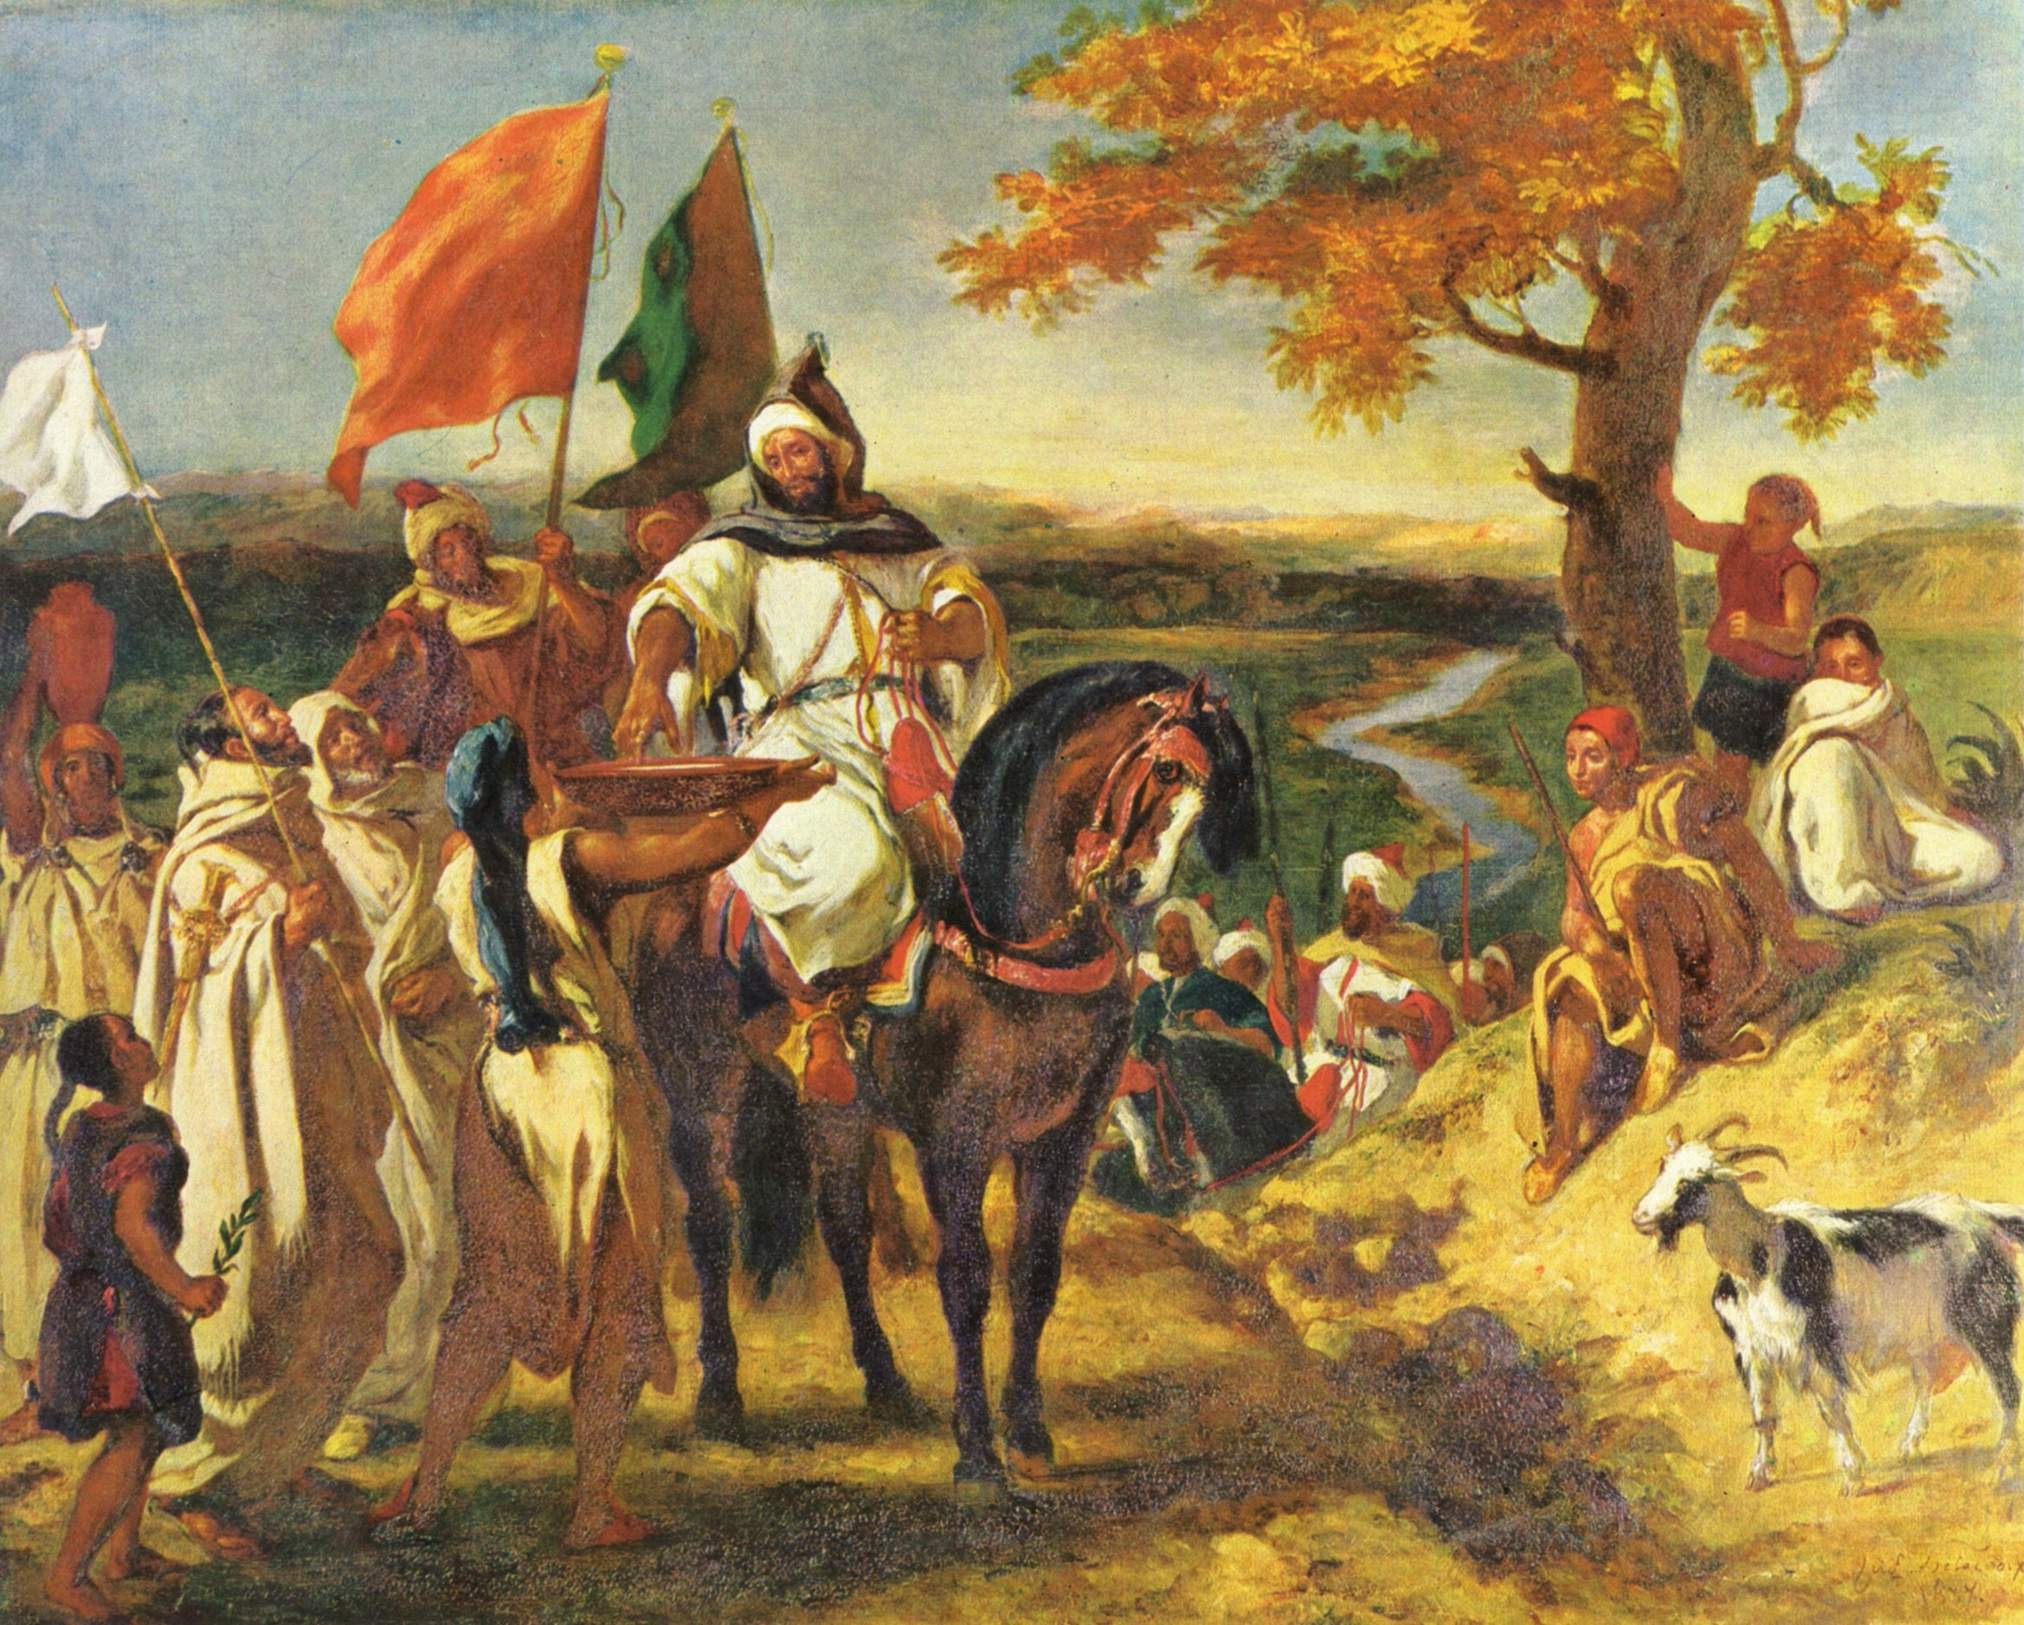 Eugene Delacroix Shaykh « Eugene Delacroix « Artists « Art might ...: artmight.com/Artists/Eugene-Delacroix/Eugene-Delacroix-Shaykh...